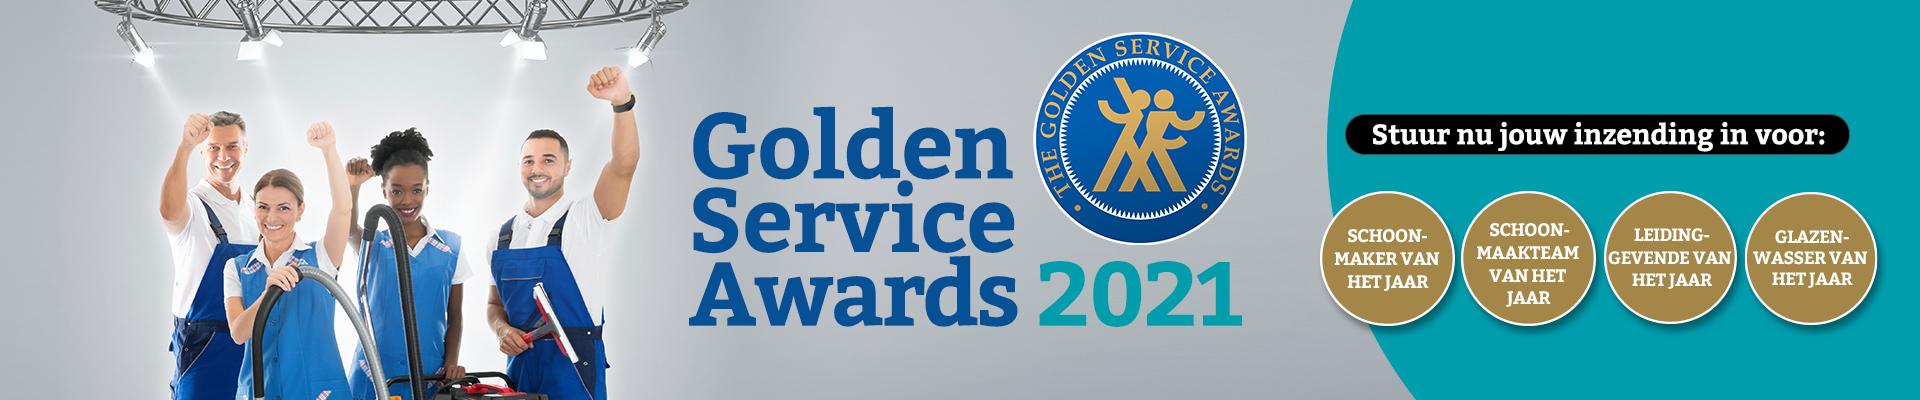 Golden Service Awards 2021